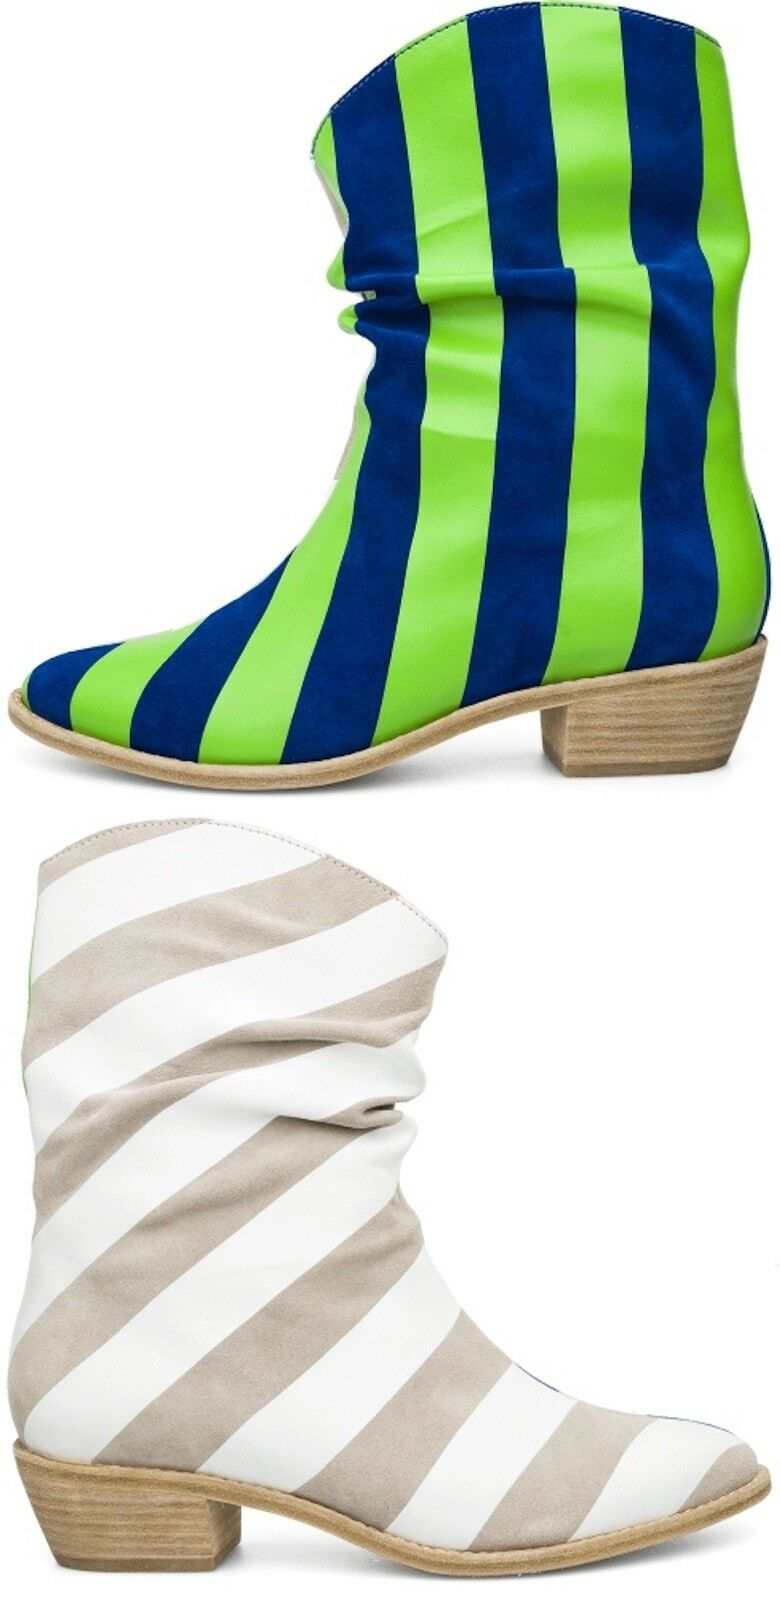 $320 Bernhard Willhelm X Camper US 7 Together Twins Ankle Boots 46721-001